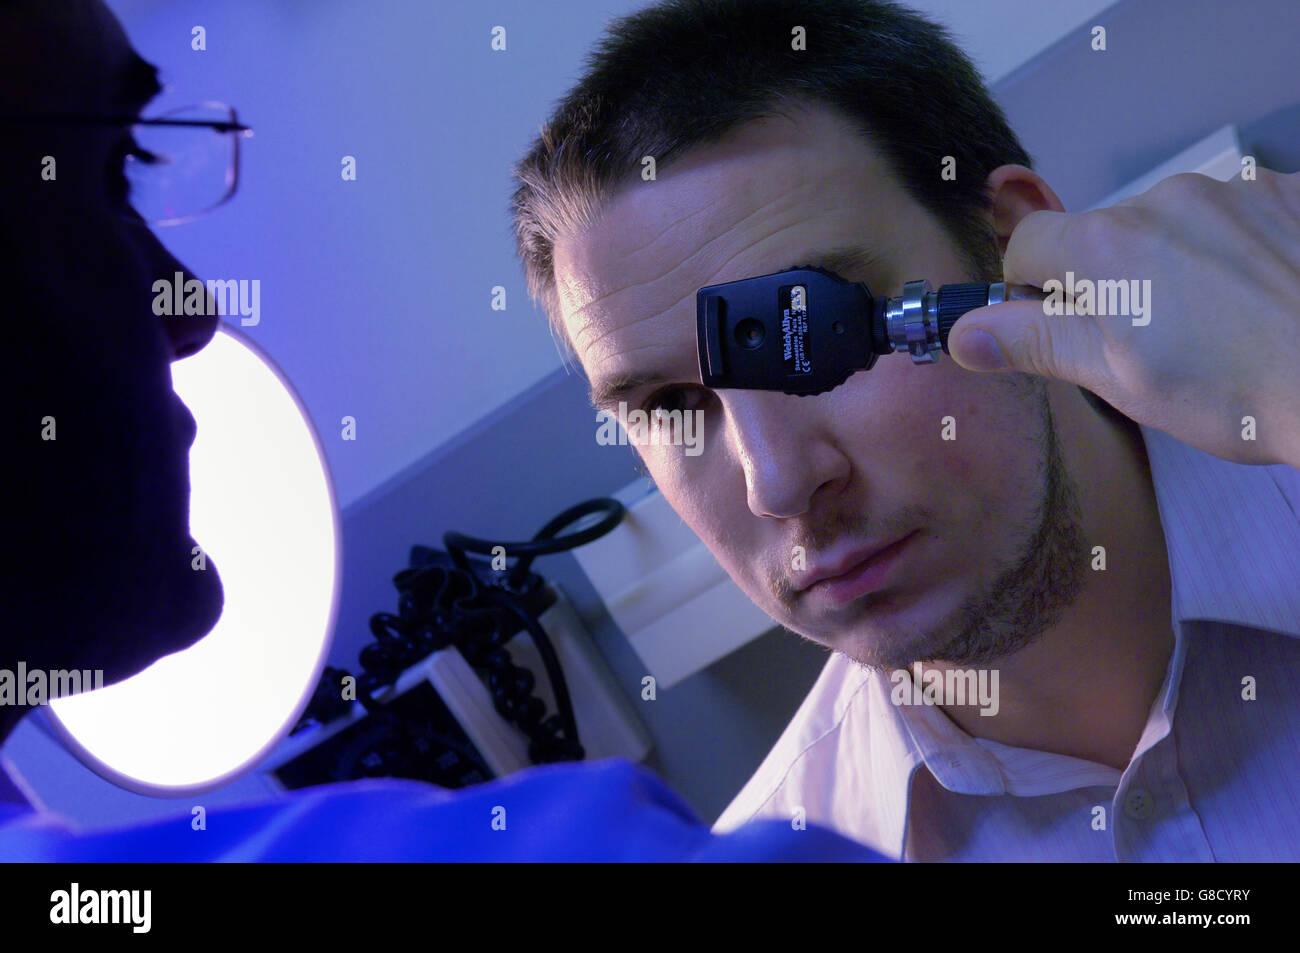 Eye examination using a Ophthalmoscope - Stock Image